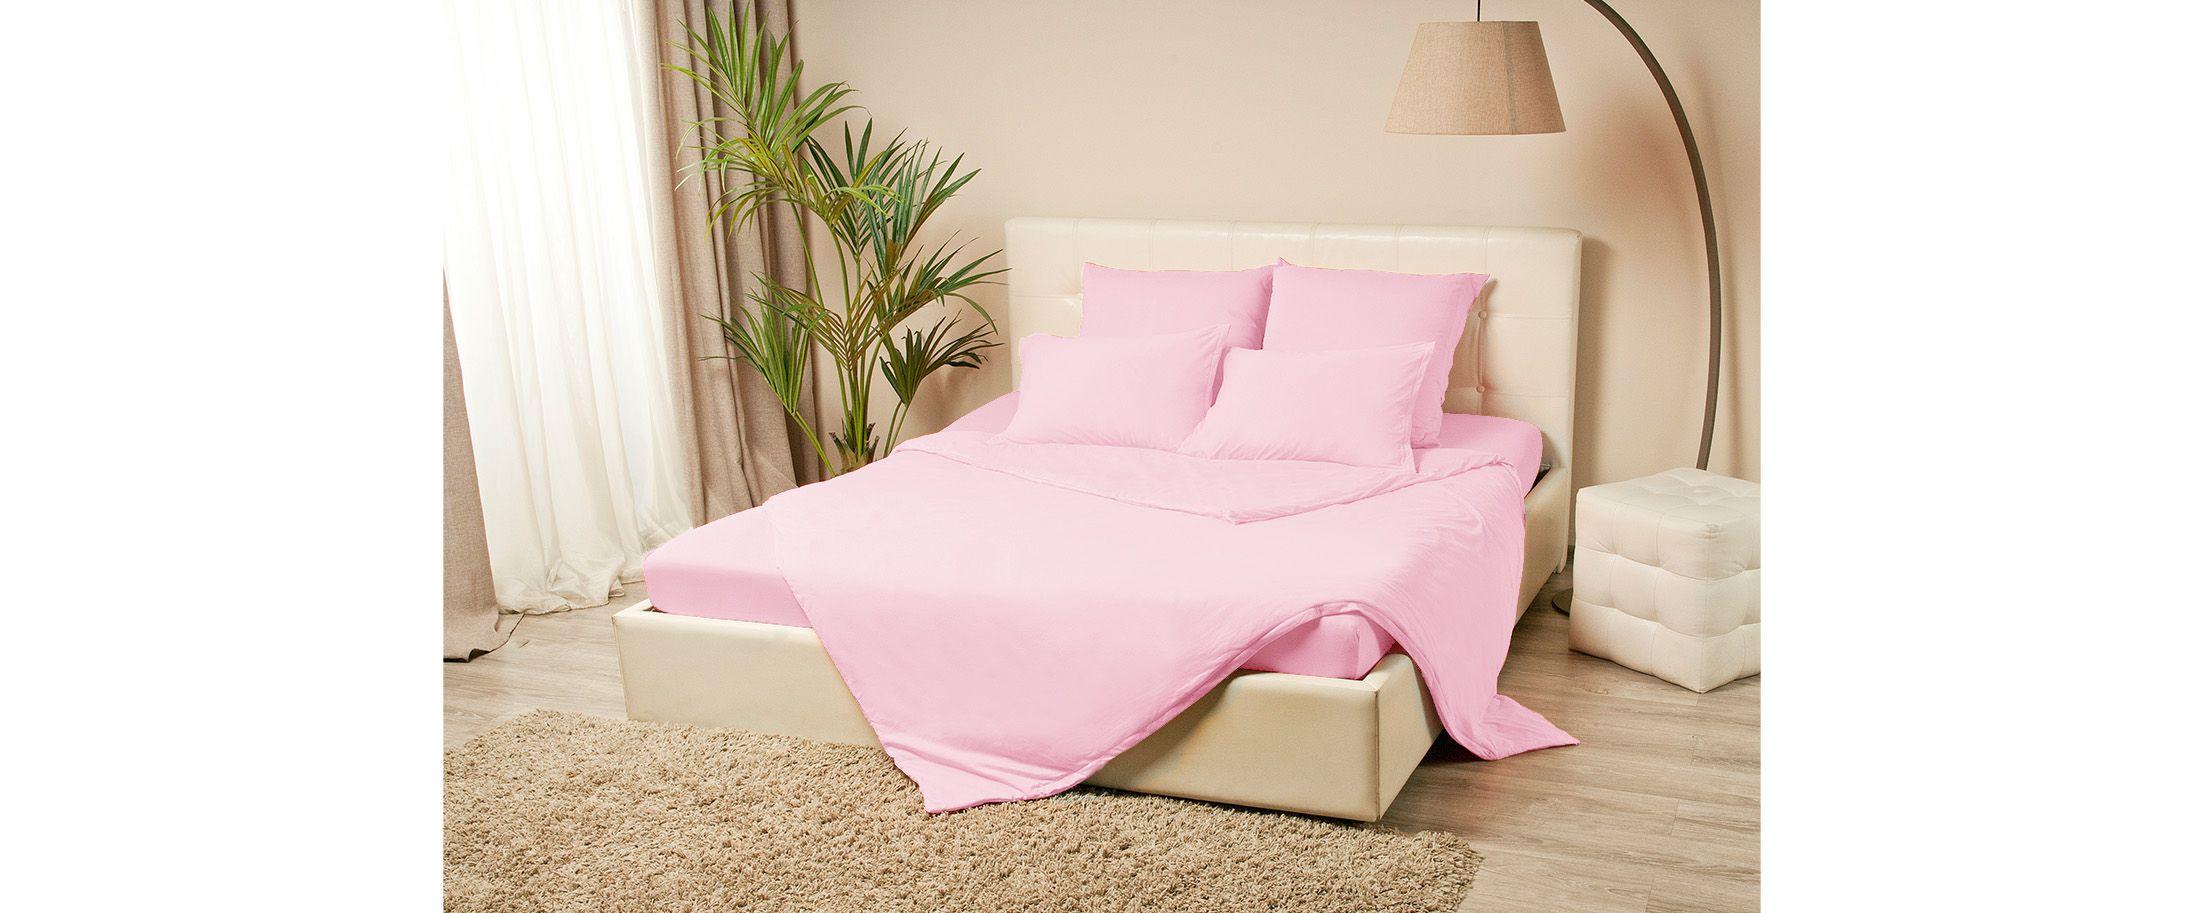 Простыня трикотажная на резинке 160х200 розового цвета Violett Модель 4000Простыня трикотажная на резинке 160х200 Violett Модель 4000. Артикул К000631<br>